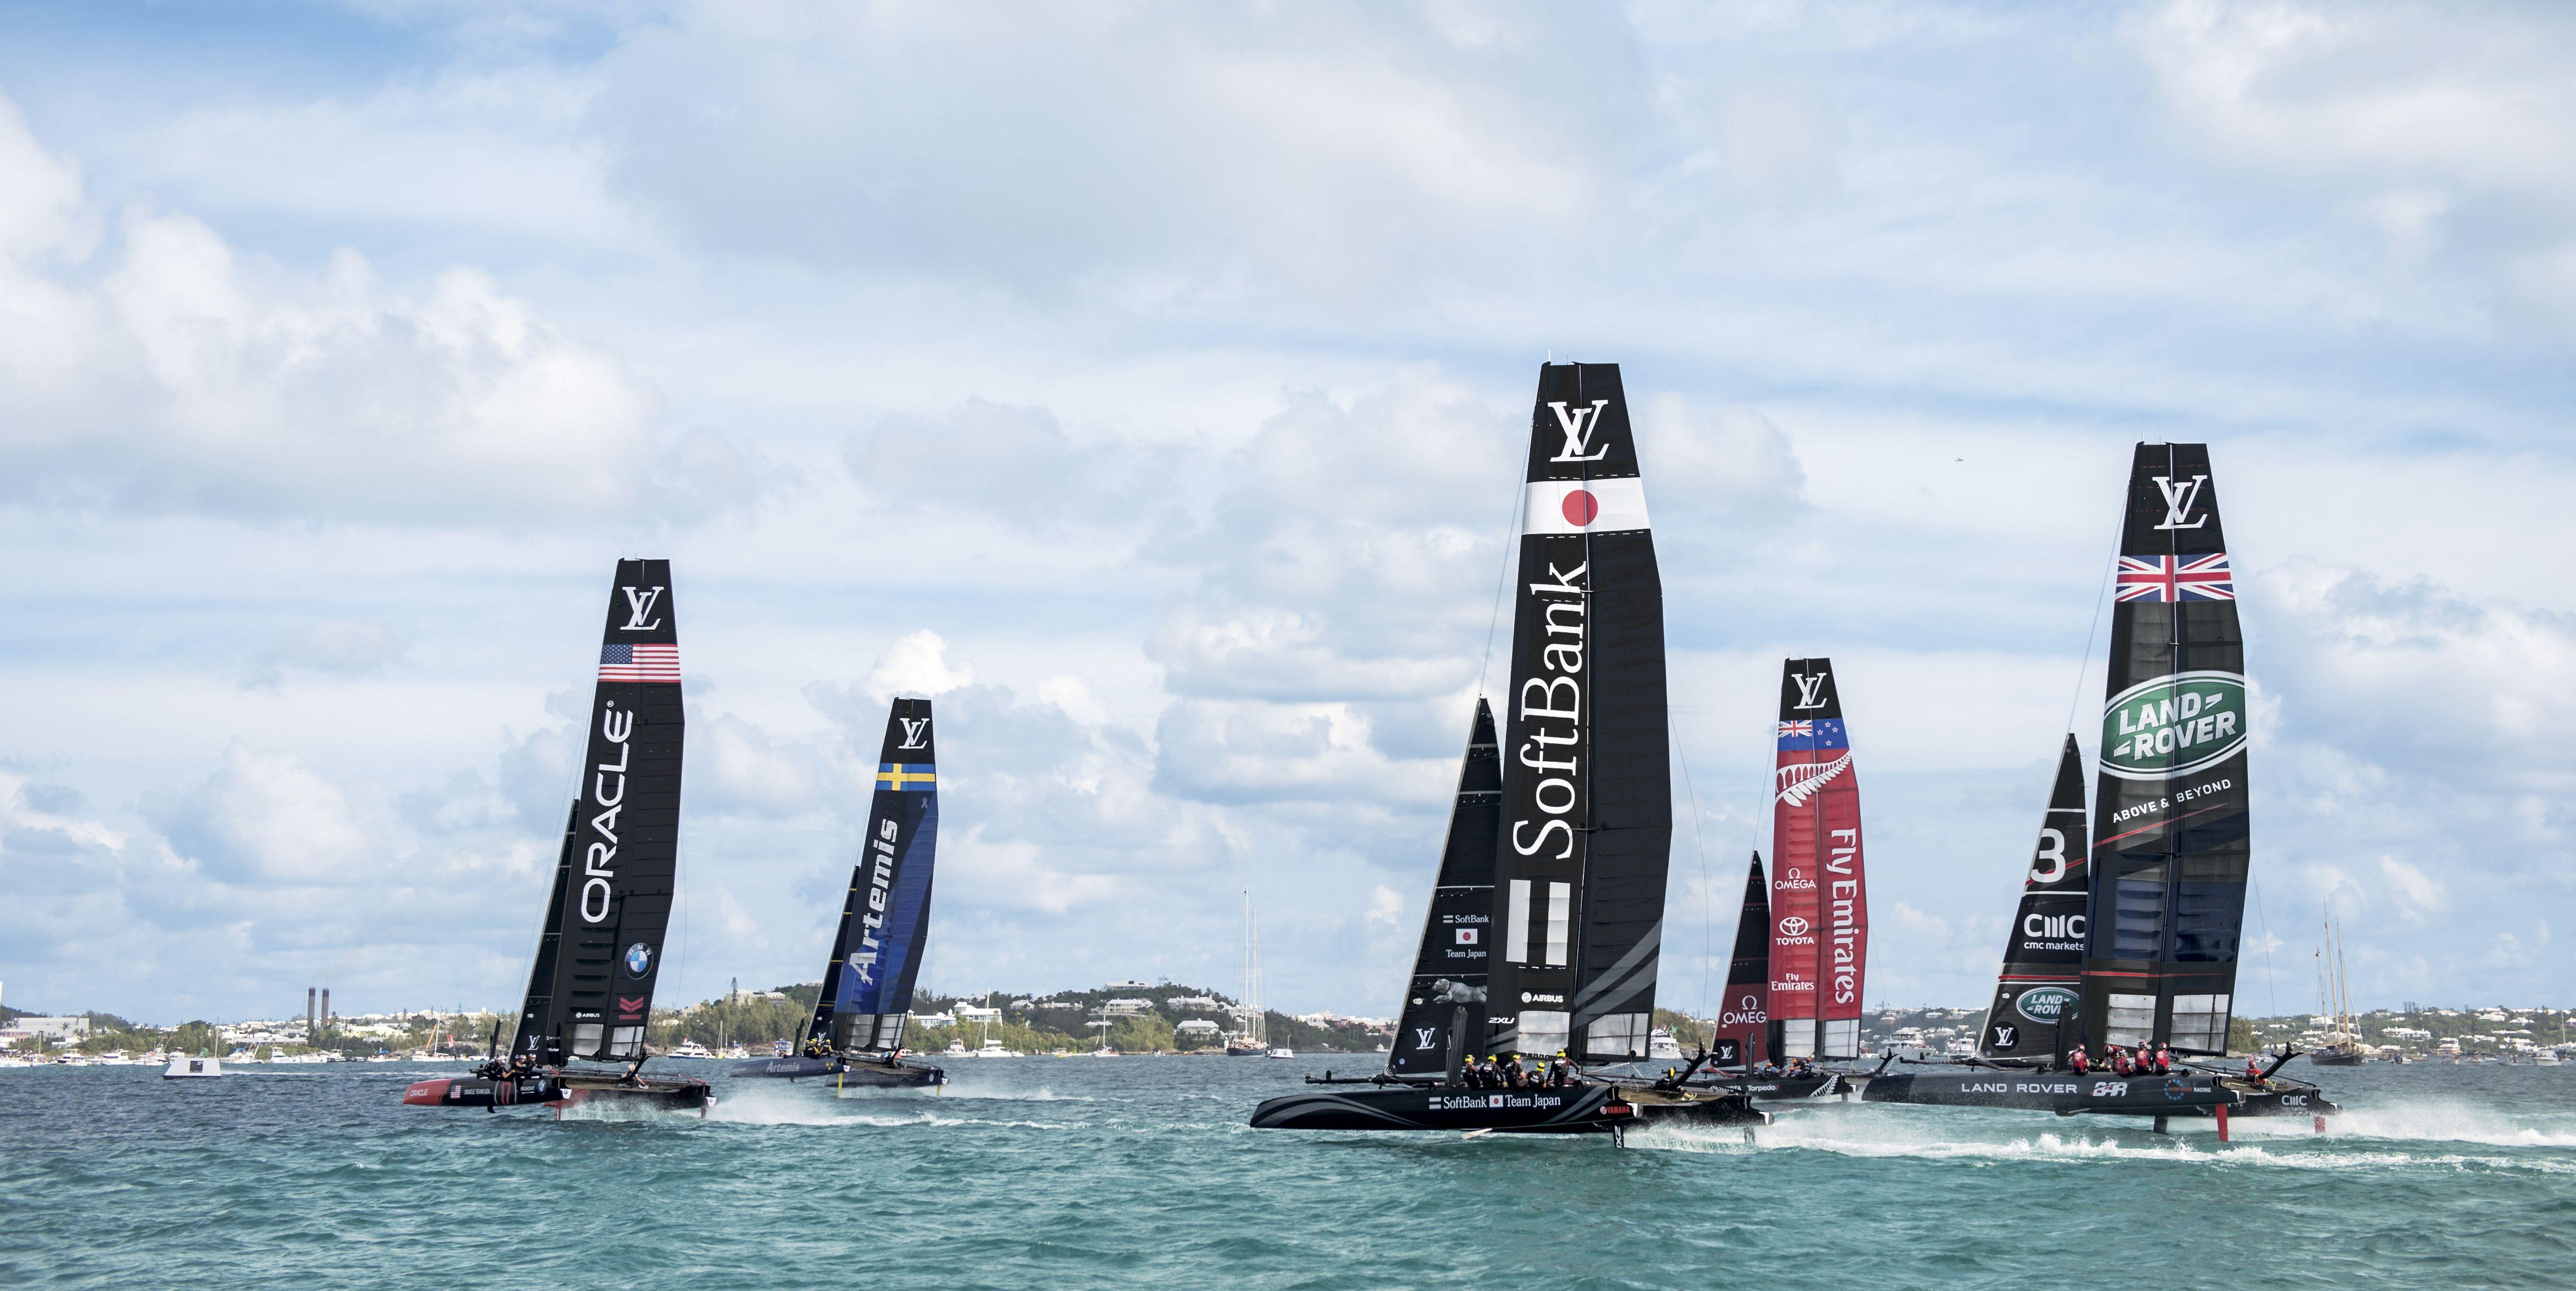 America's Cup Bermuda Boats